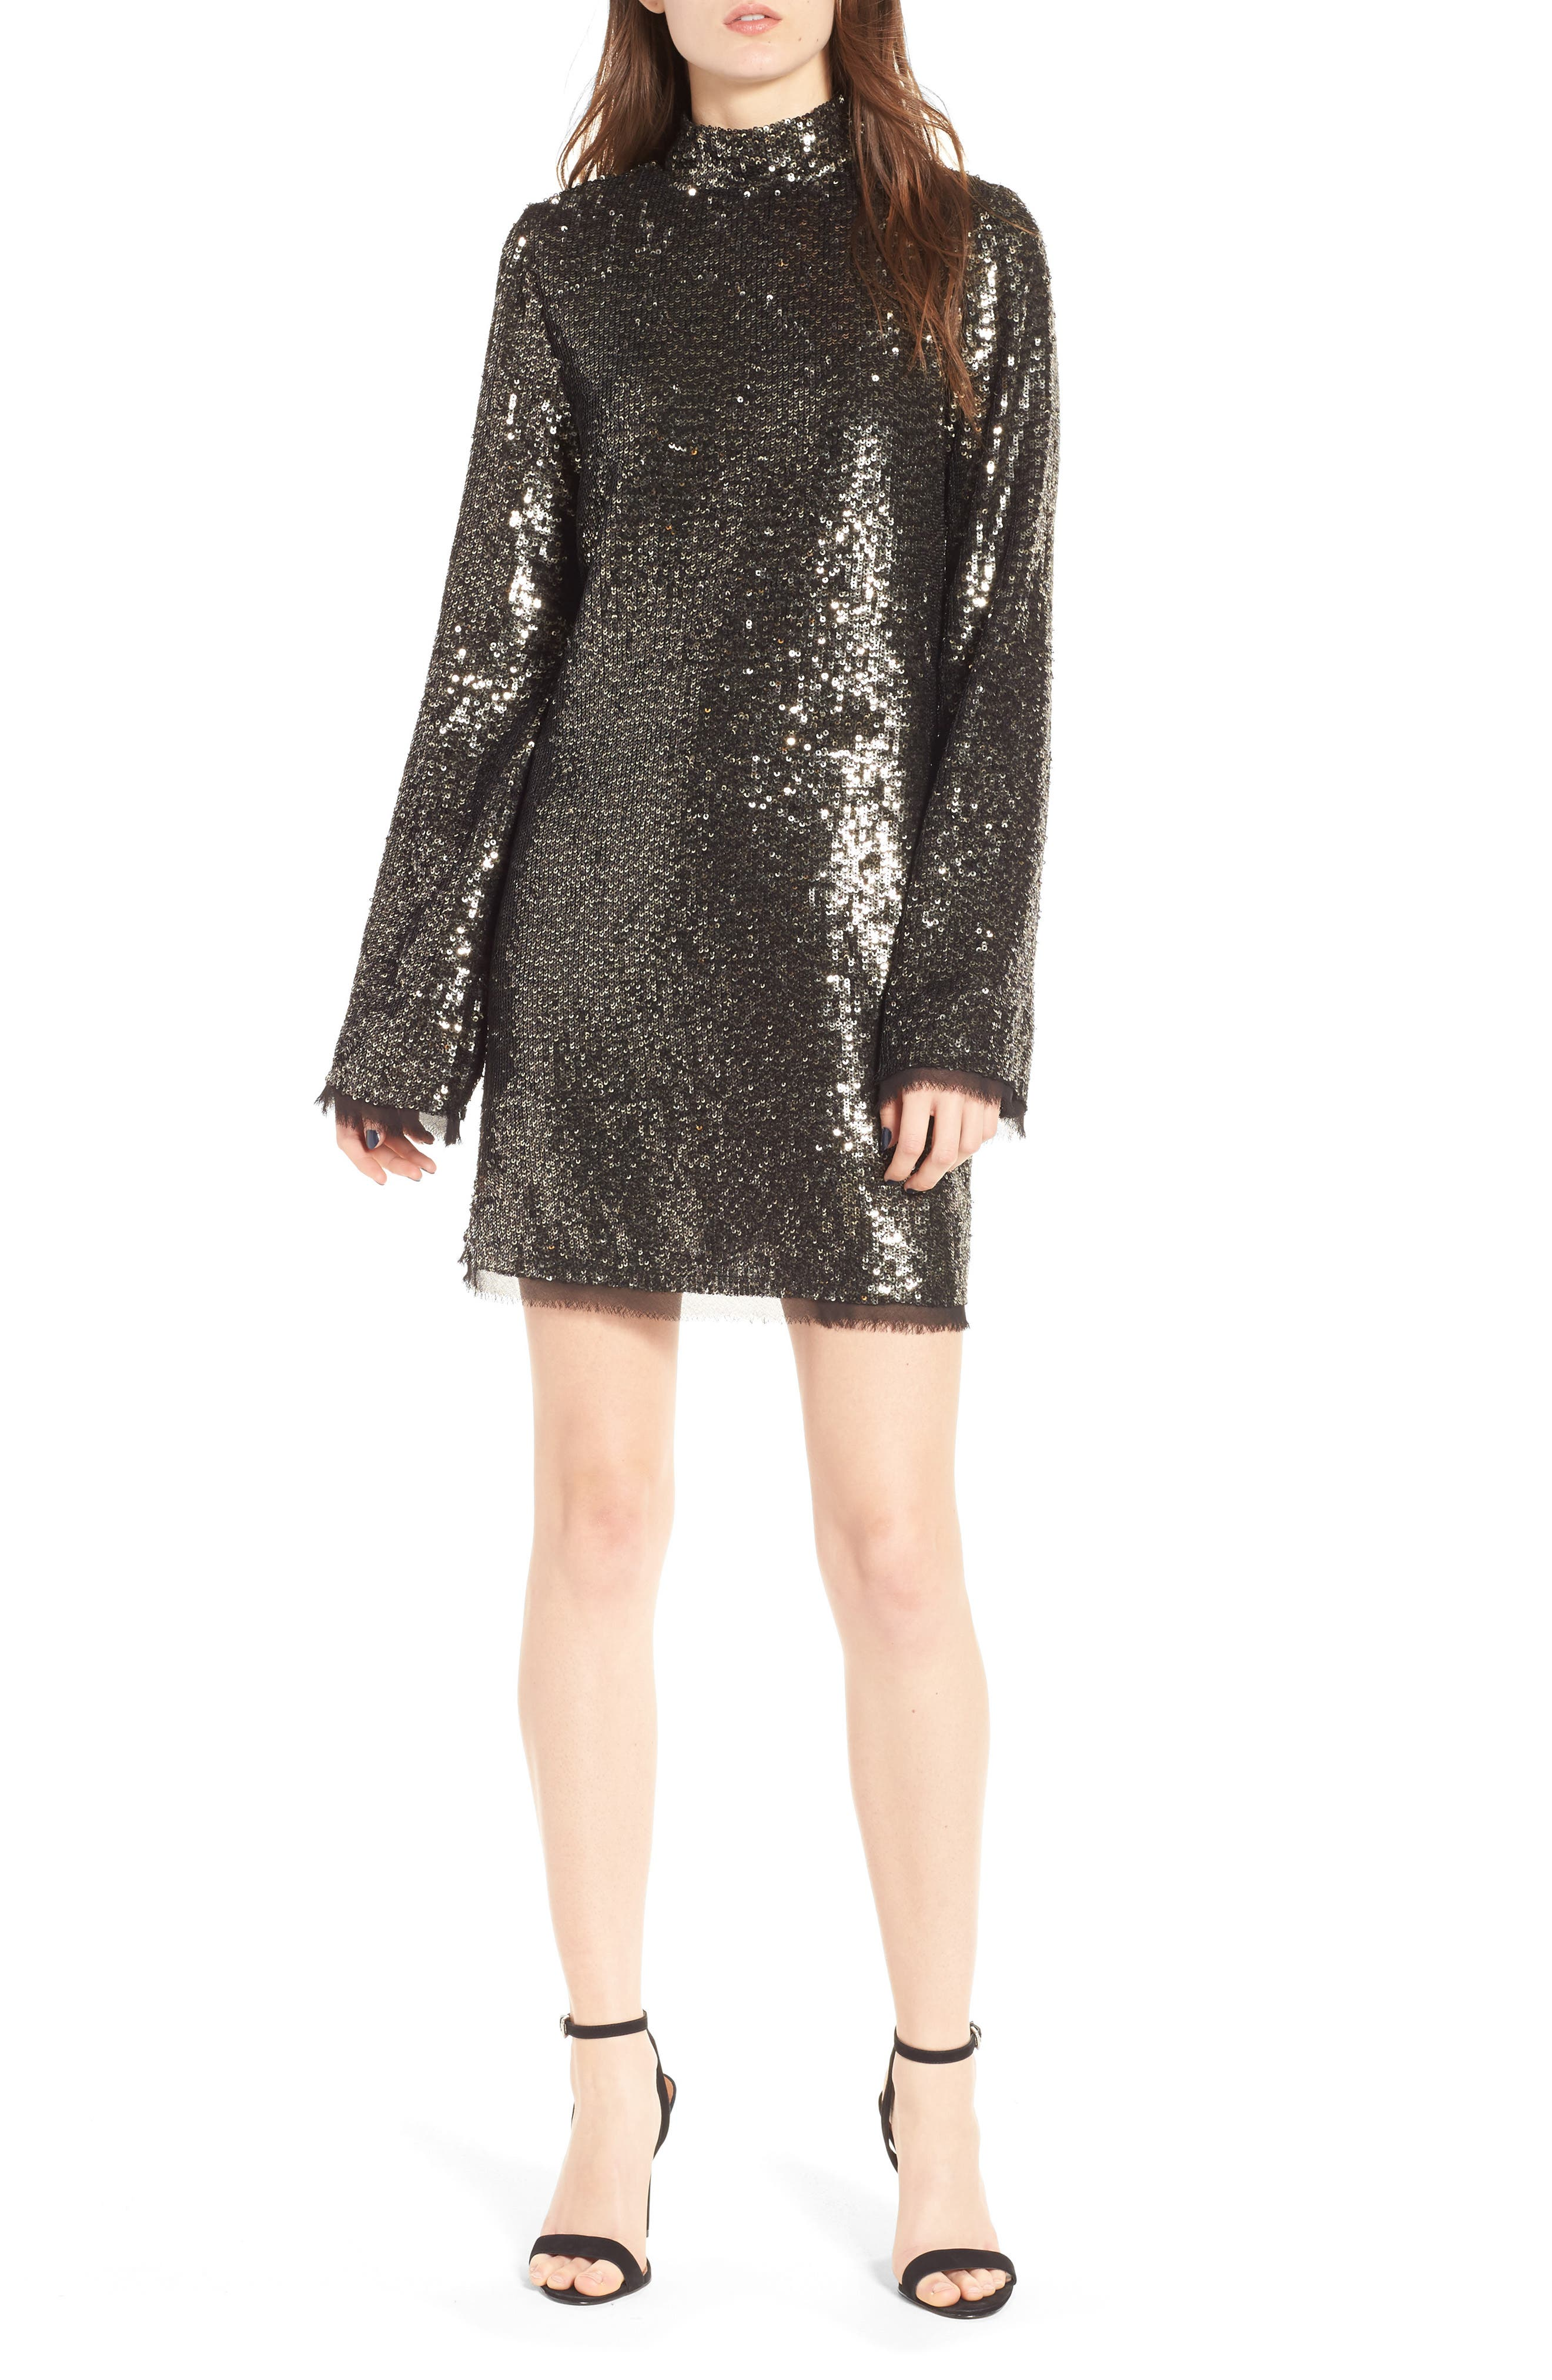 Alternate Image 1 Selected - KENDALL + KYLIE Sequin Shift Dress